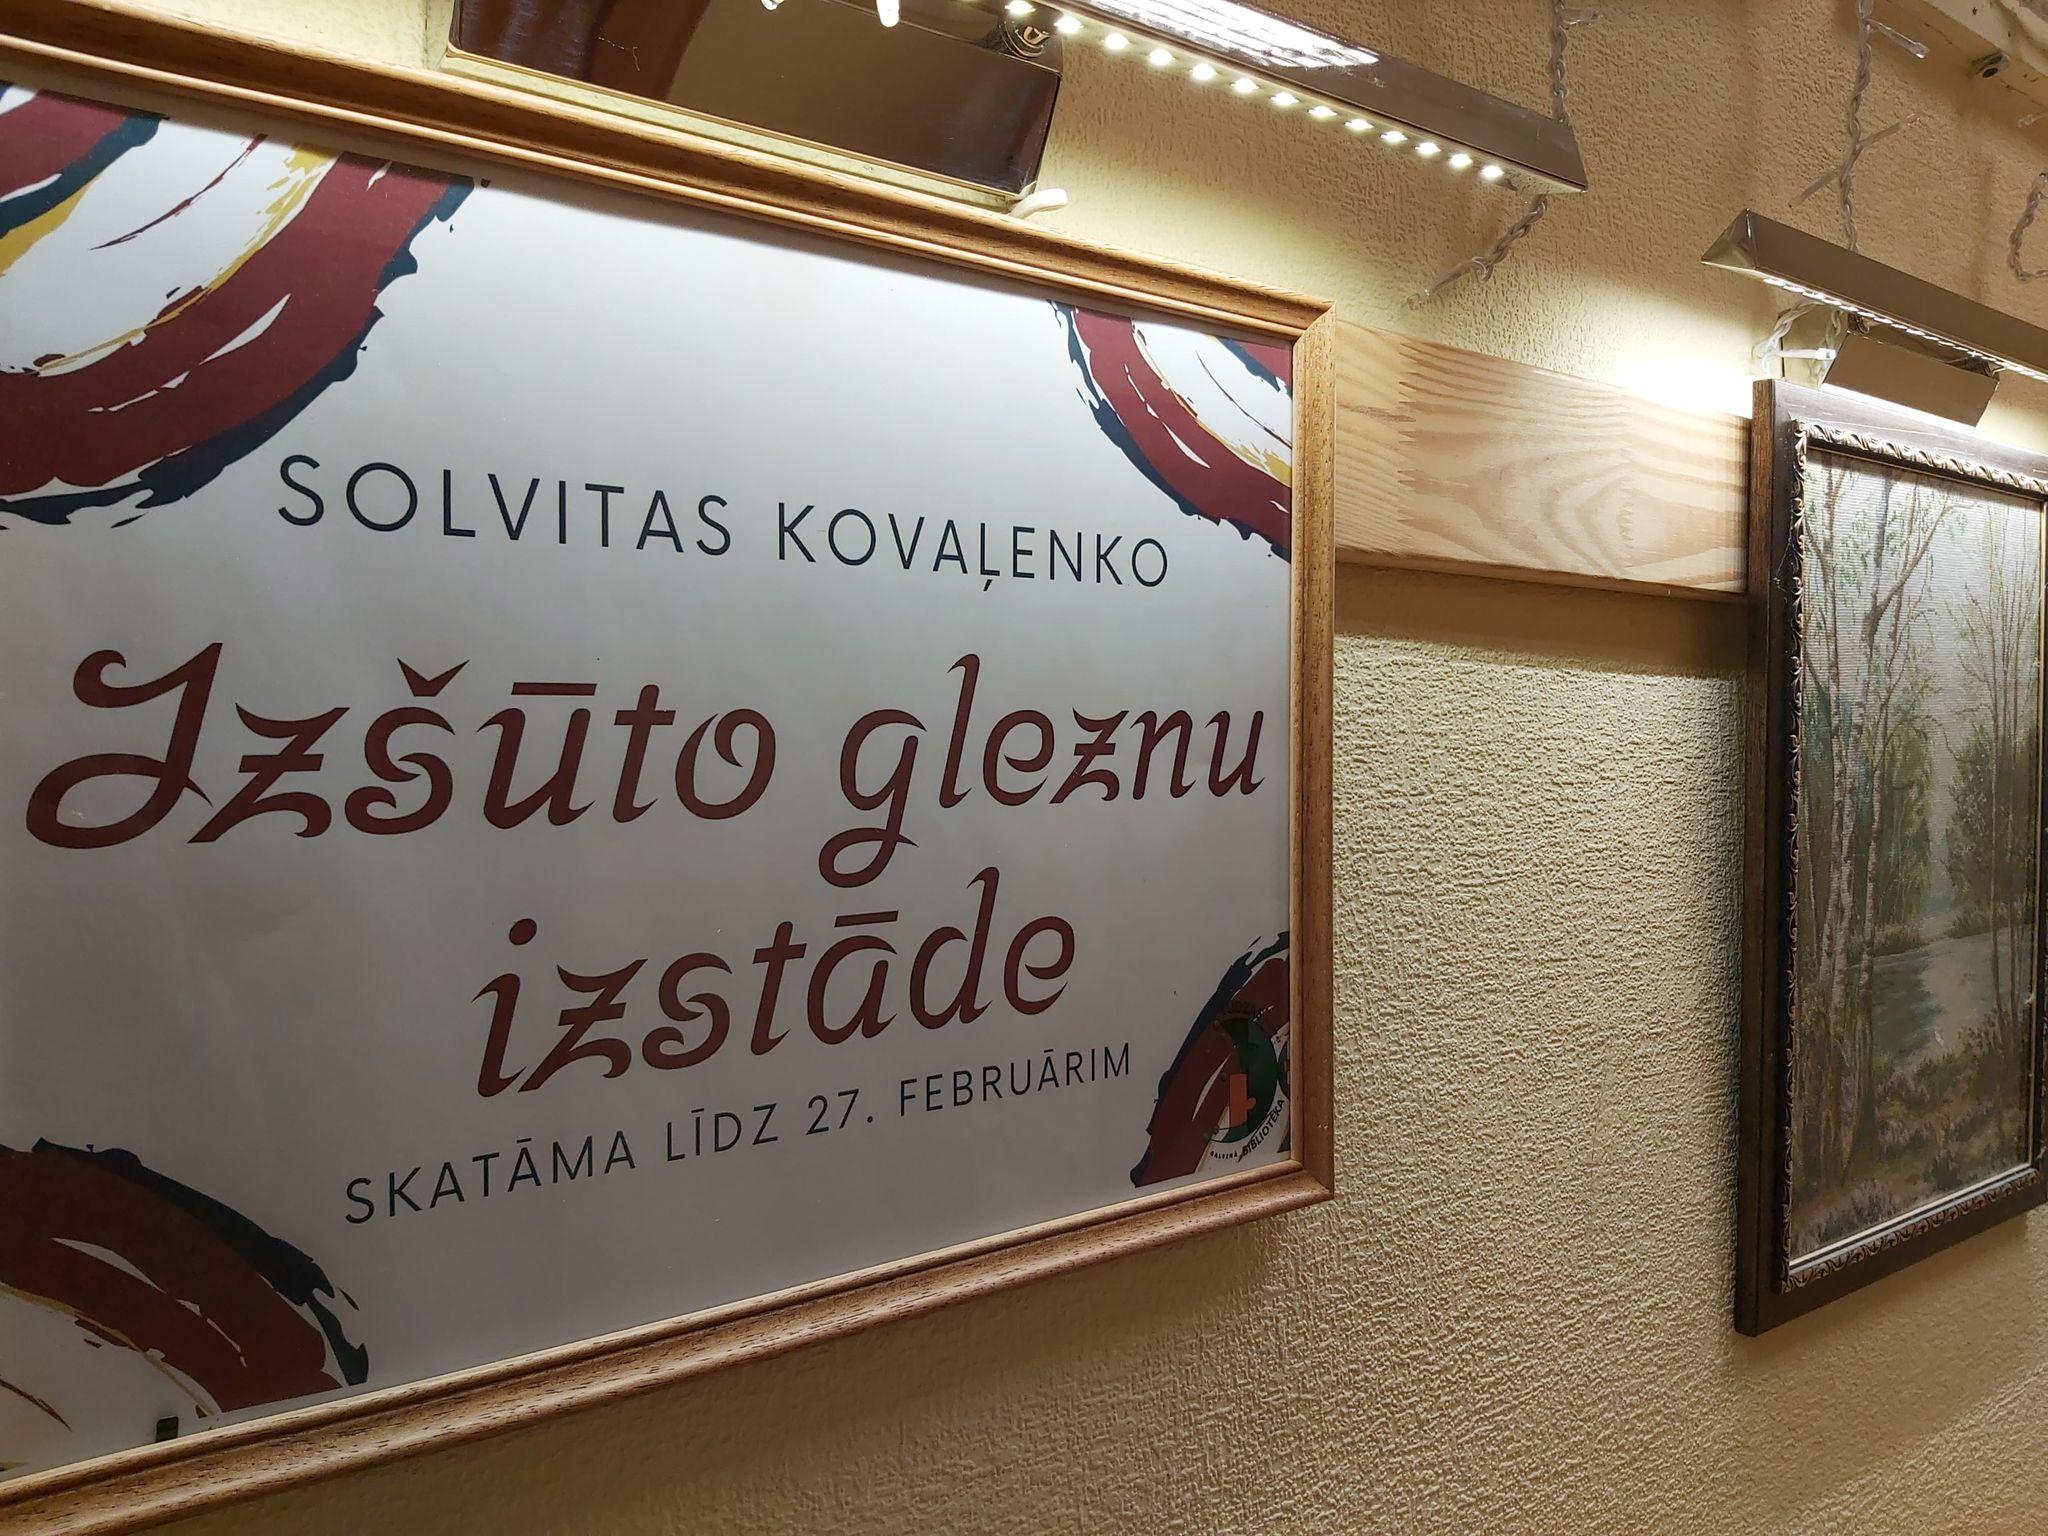 Solvitas Kovaļenko izšūto gleznu izstāde